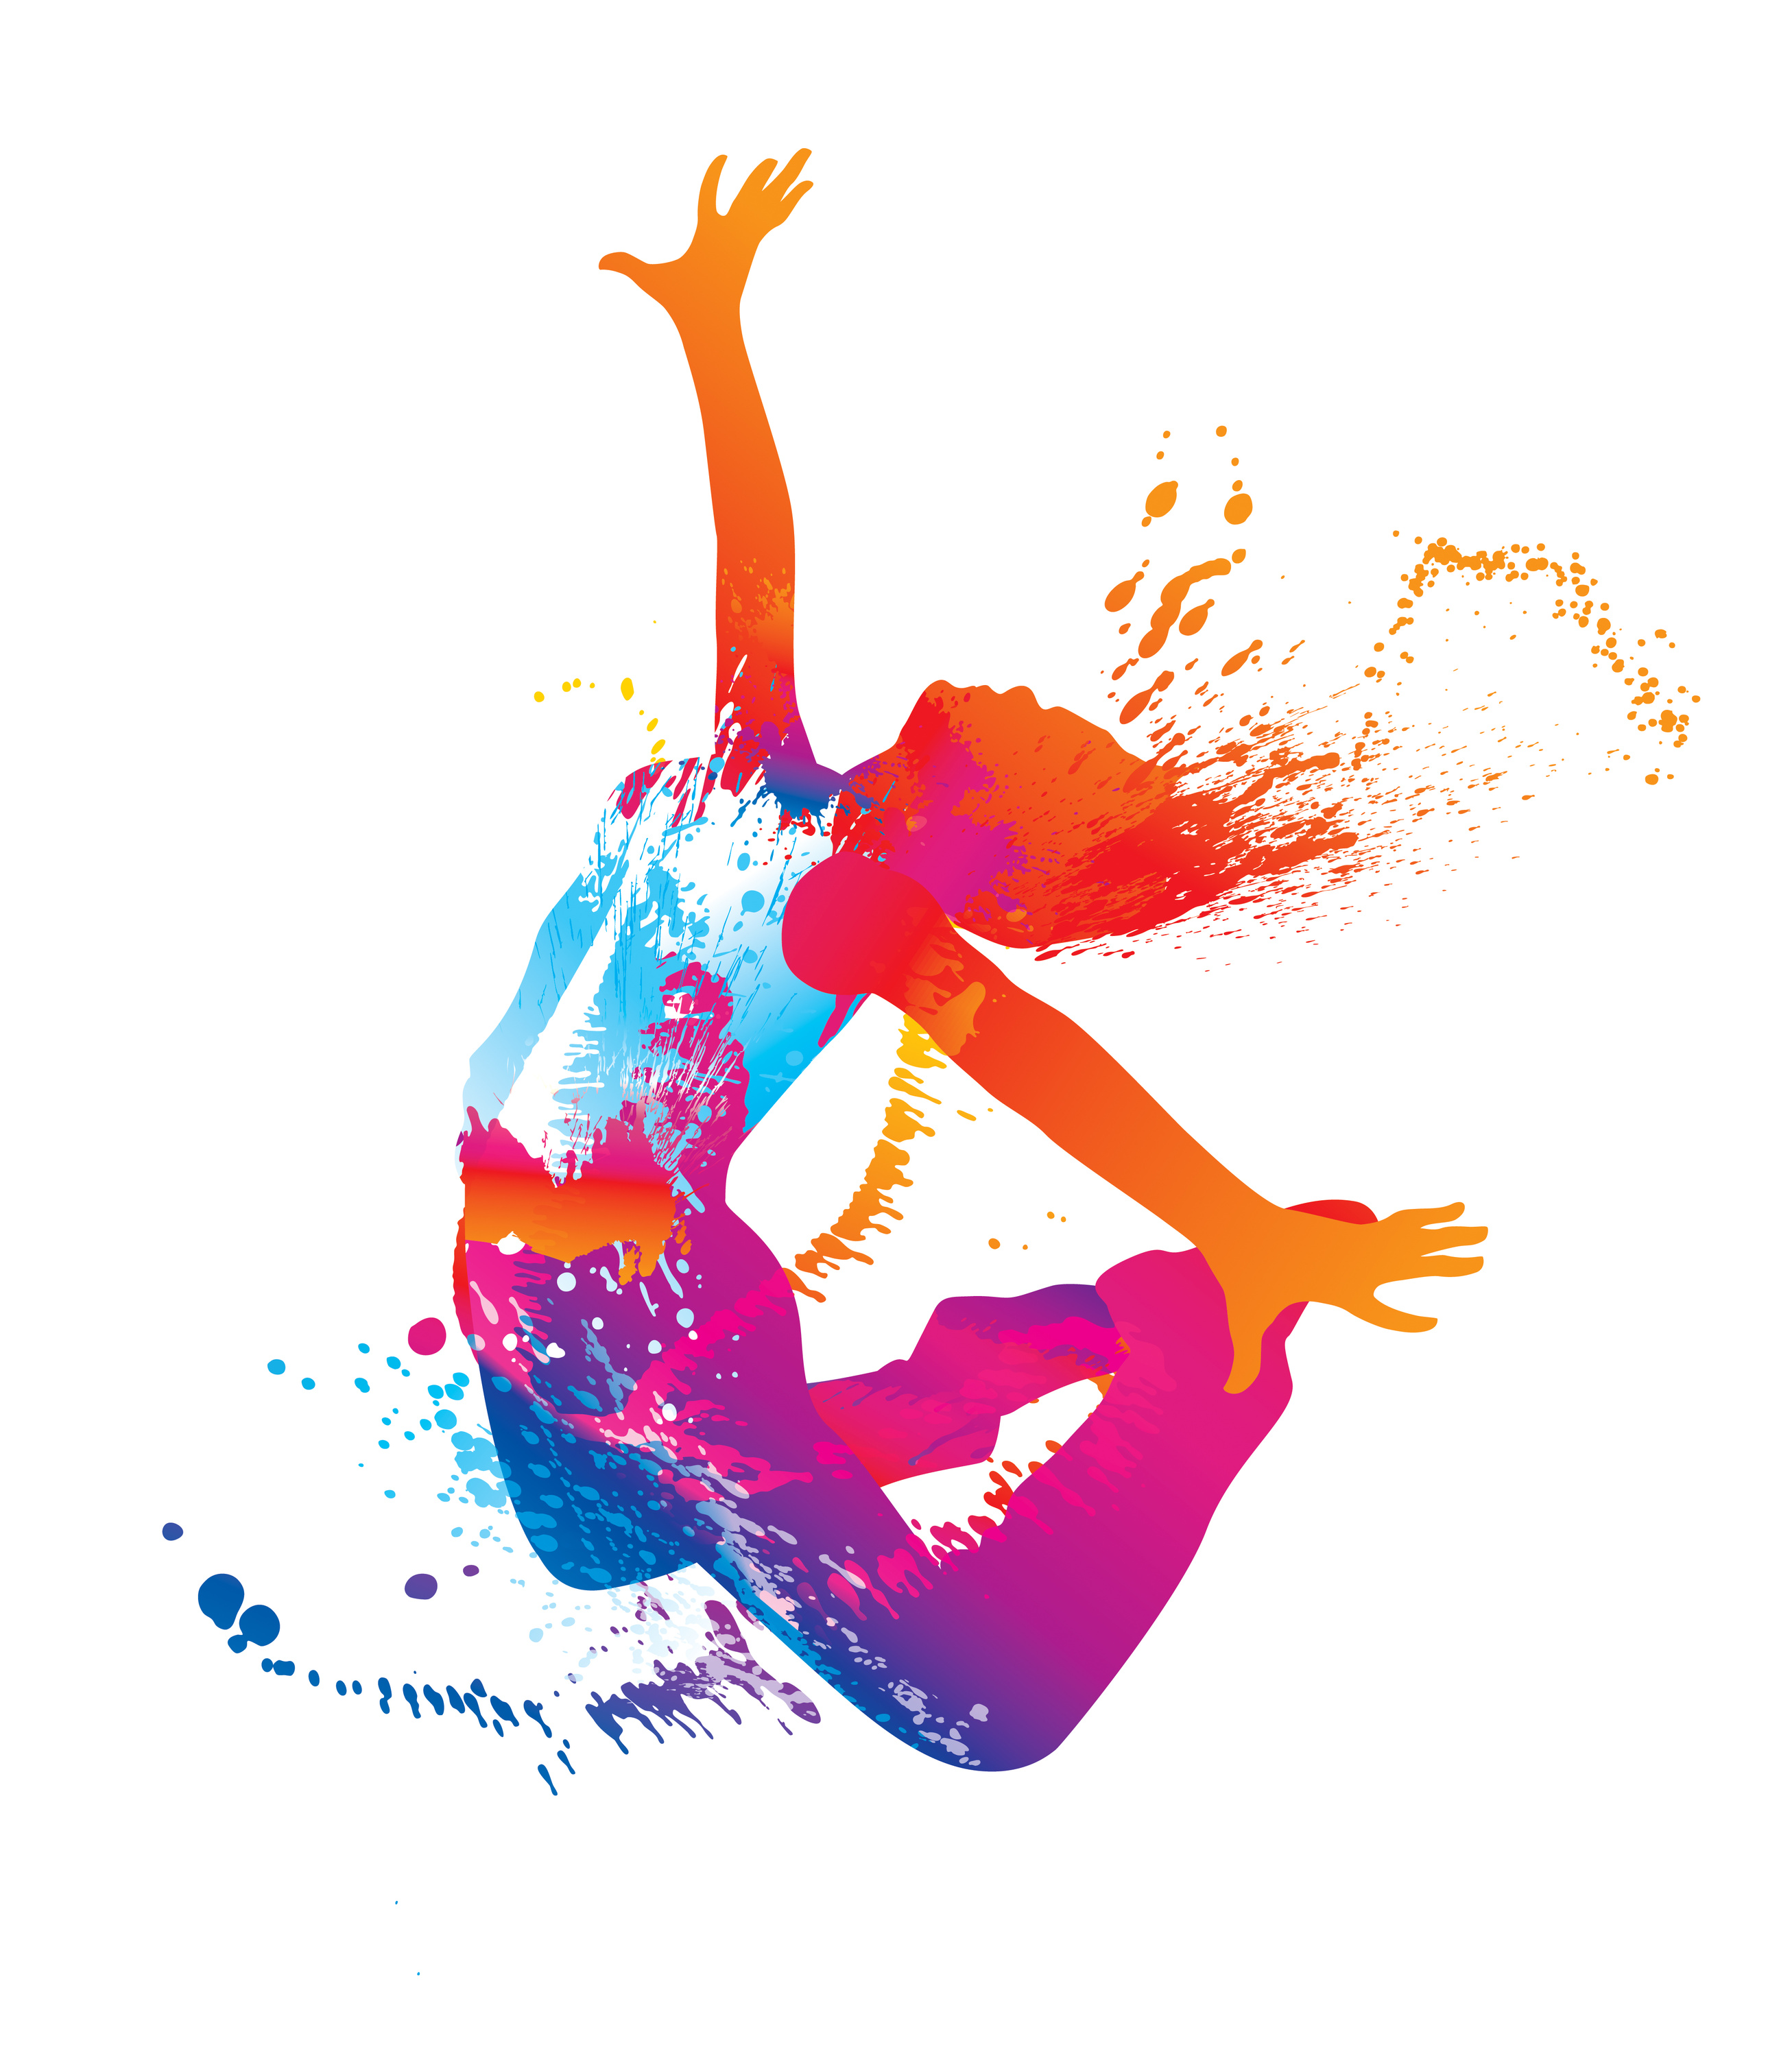 dance exercise clip art - photo #22